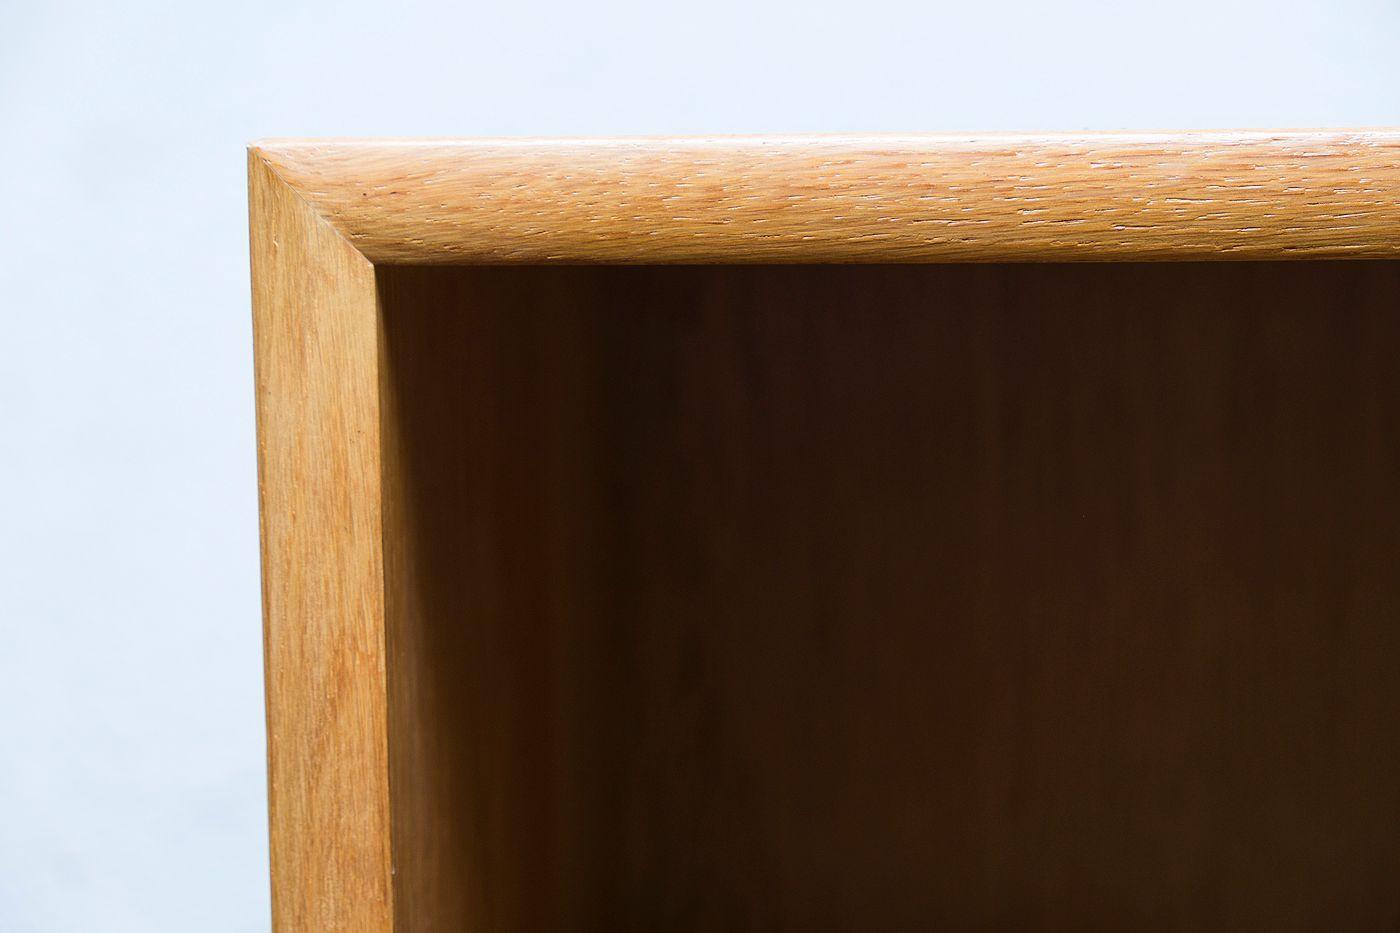 mid century german oak shelves from wk m bel 1960s for sale at pamono. Black Bedroom Furniture Sets. Home Design Ideas